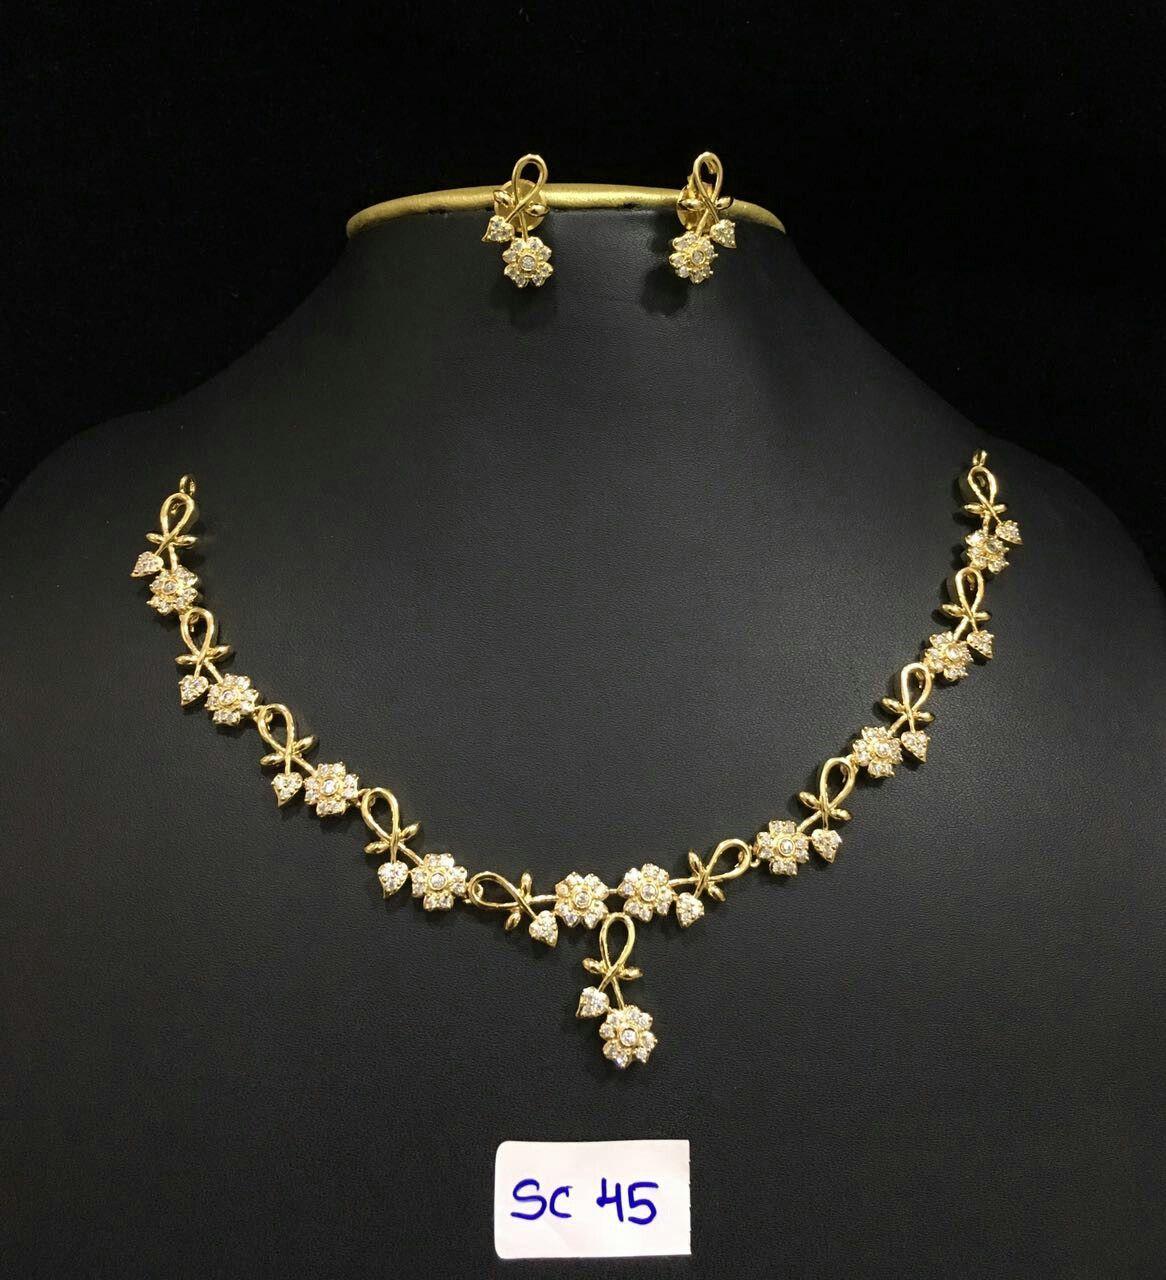 Pin by sakina jari on jewellery pinterest jewelry gold jewelry